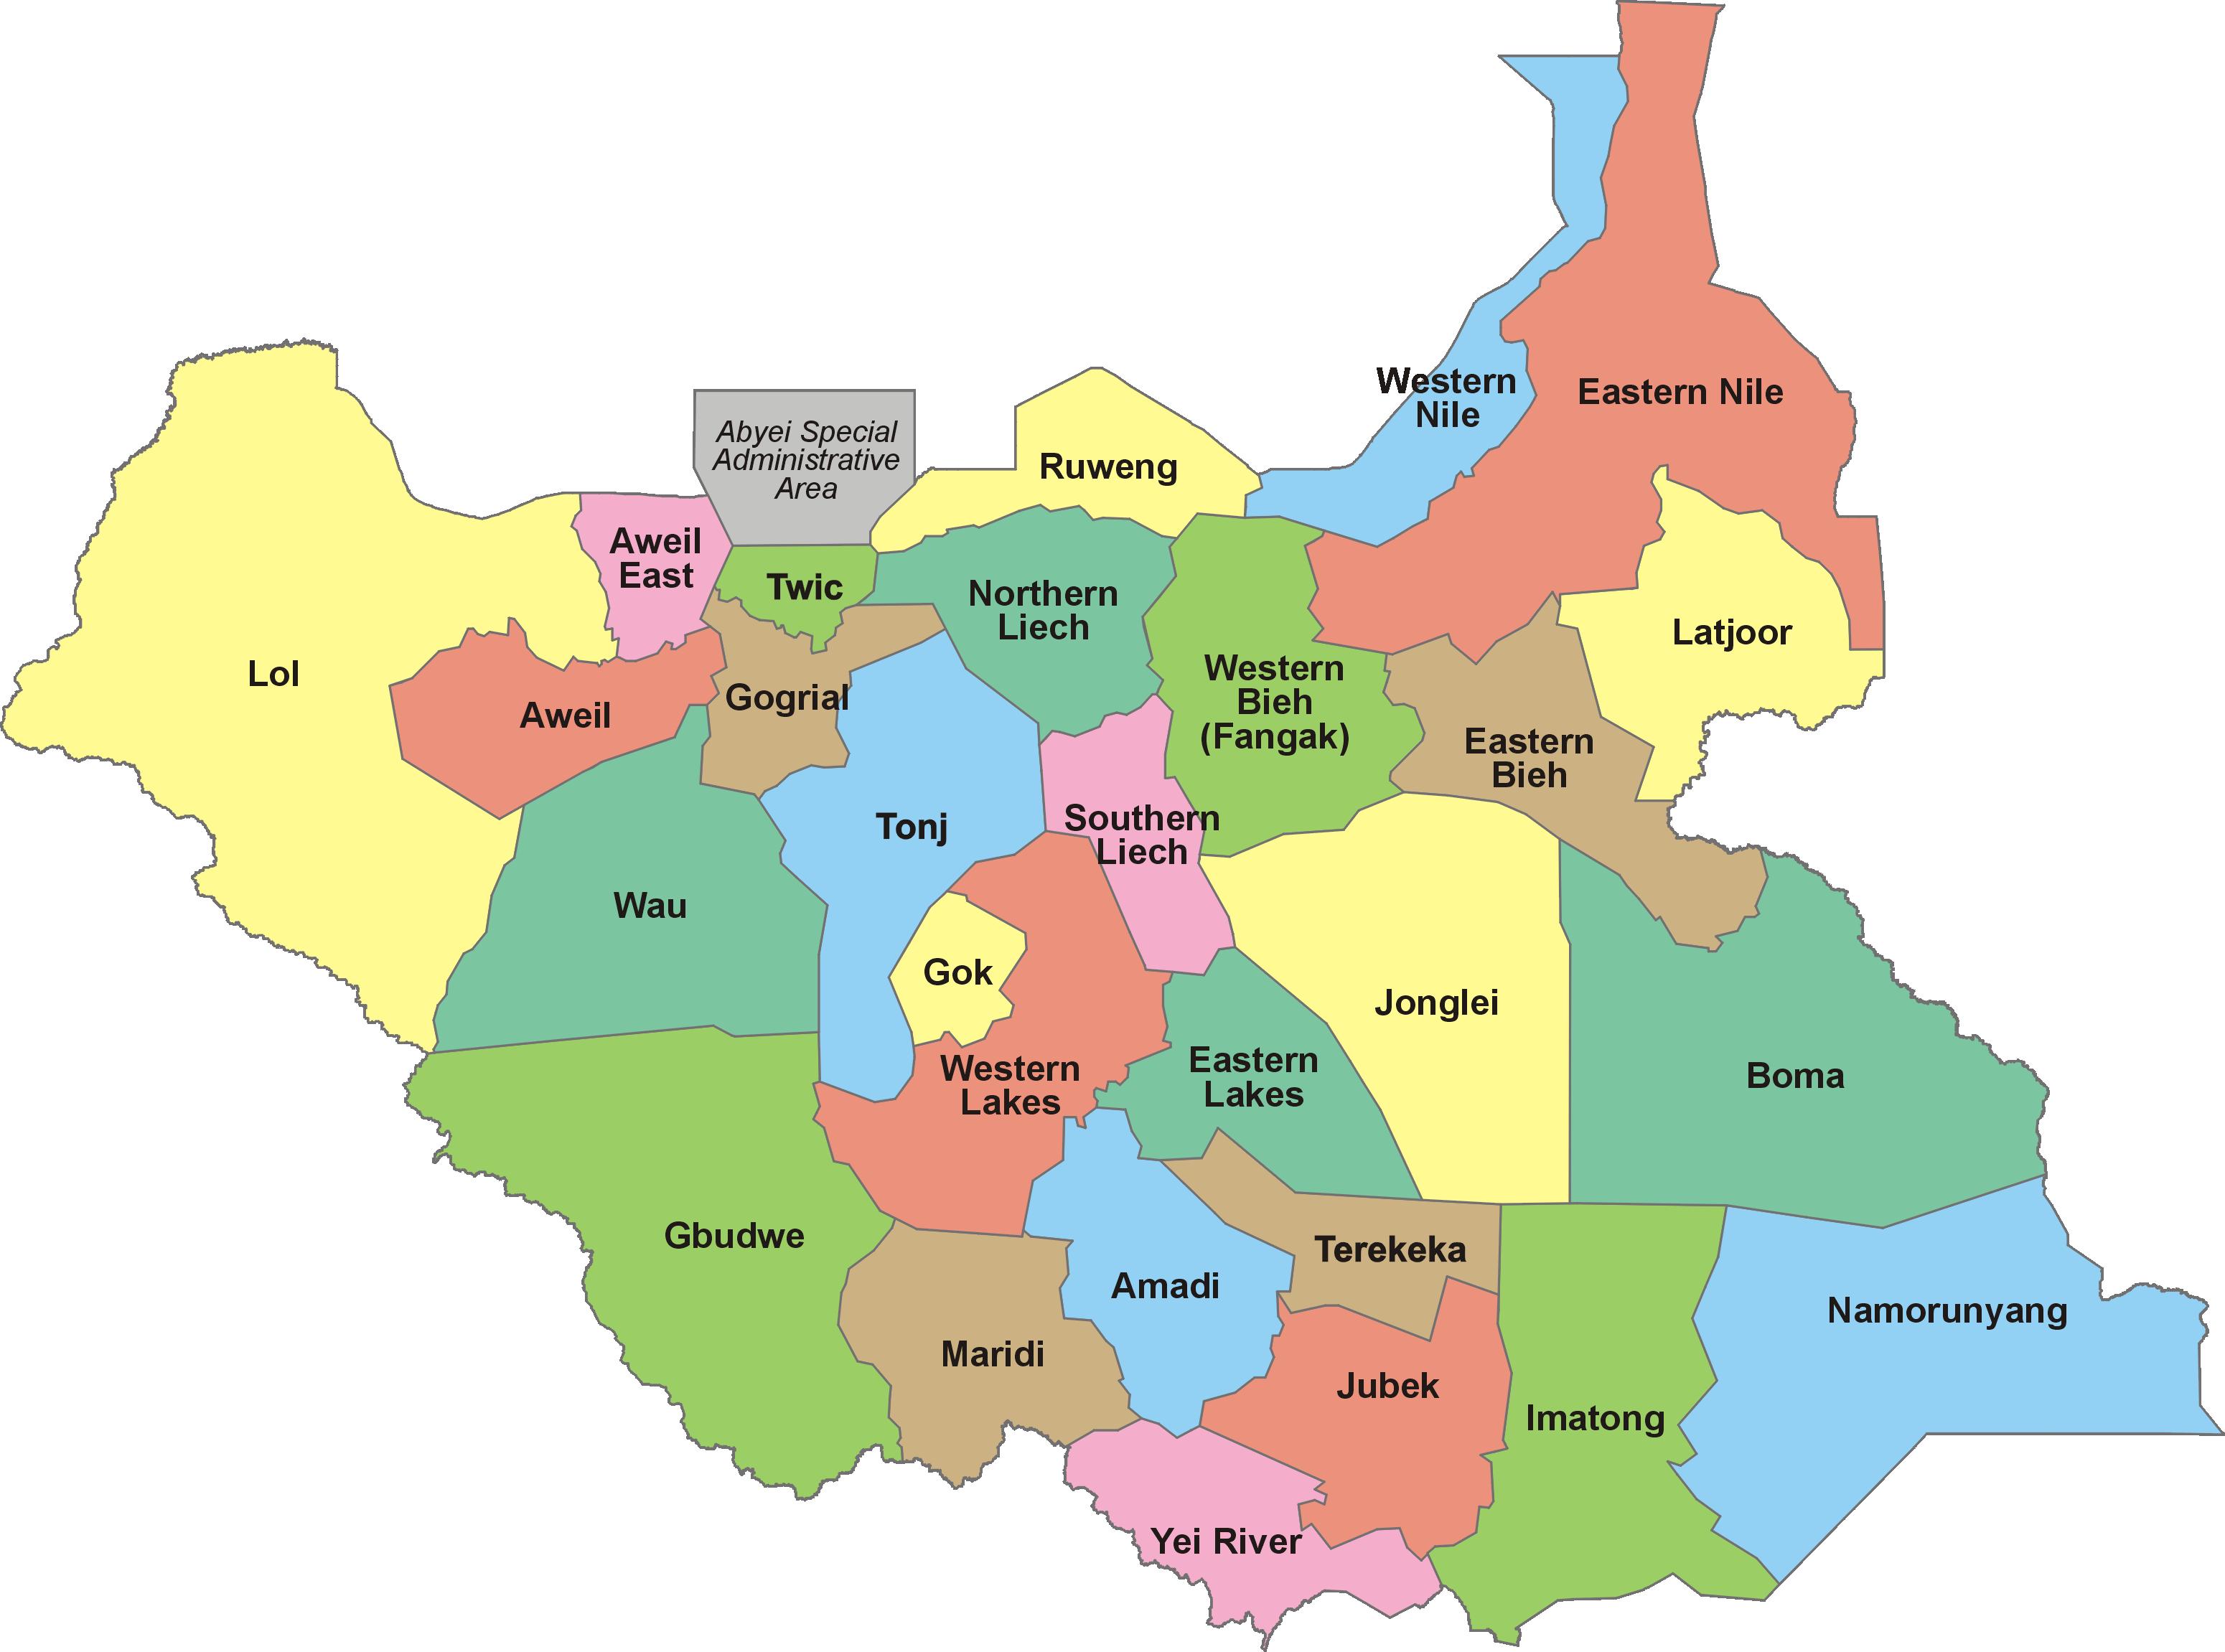 Etnik Dil Harita Panosundaki Pin